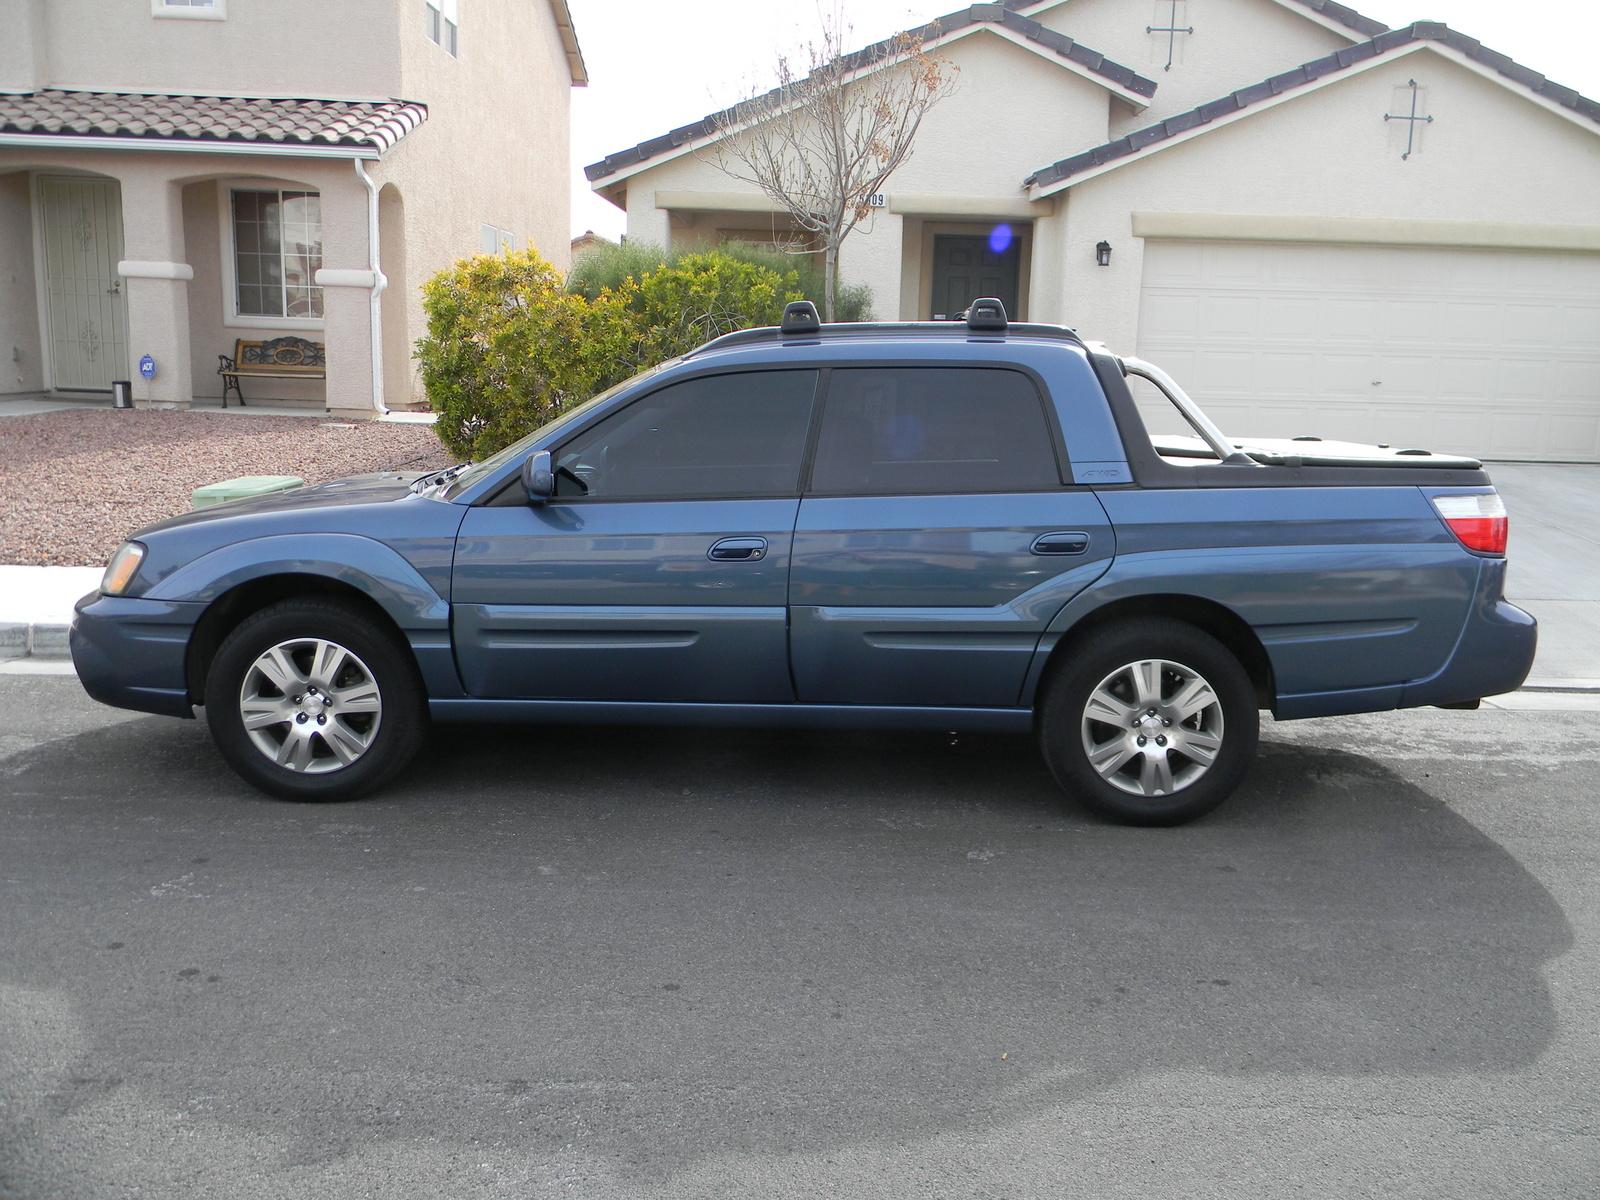 Subaru Baja Turbo >> 2006 Subaru Baja - Pictures - CarGurus